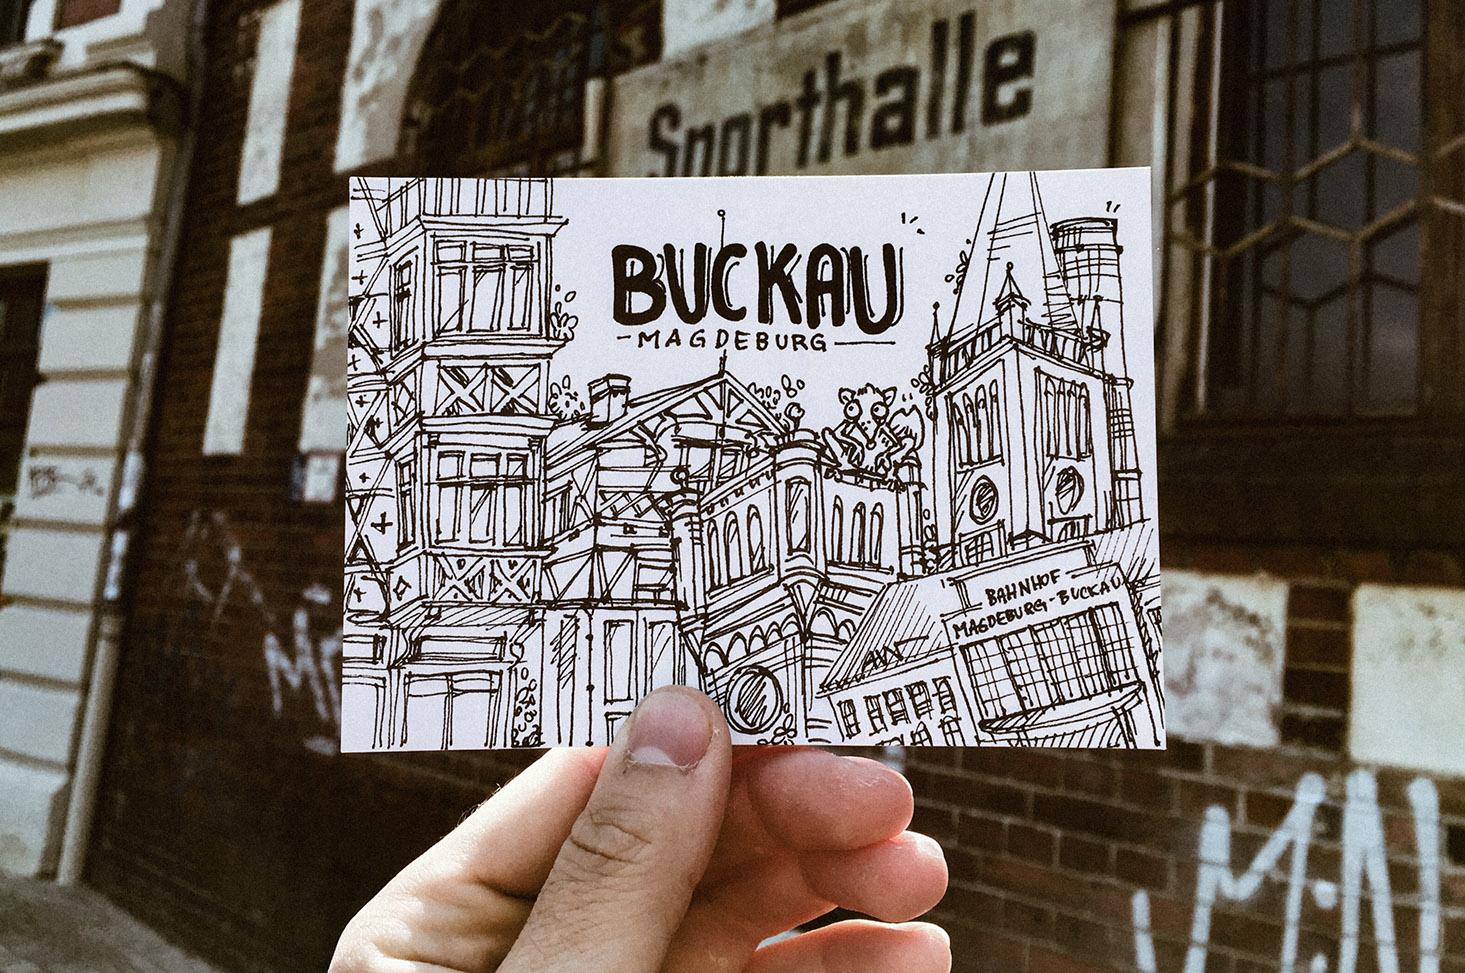 Buckau